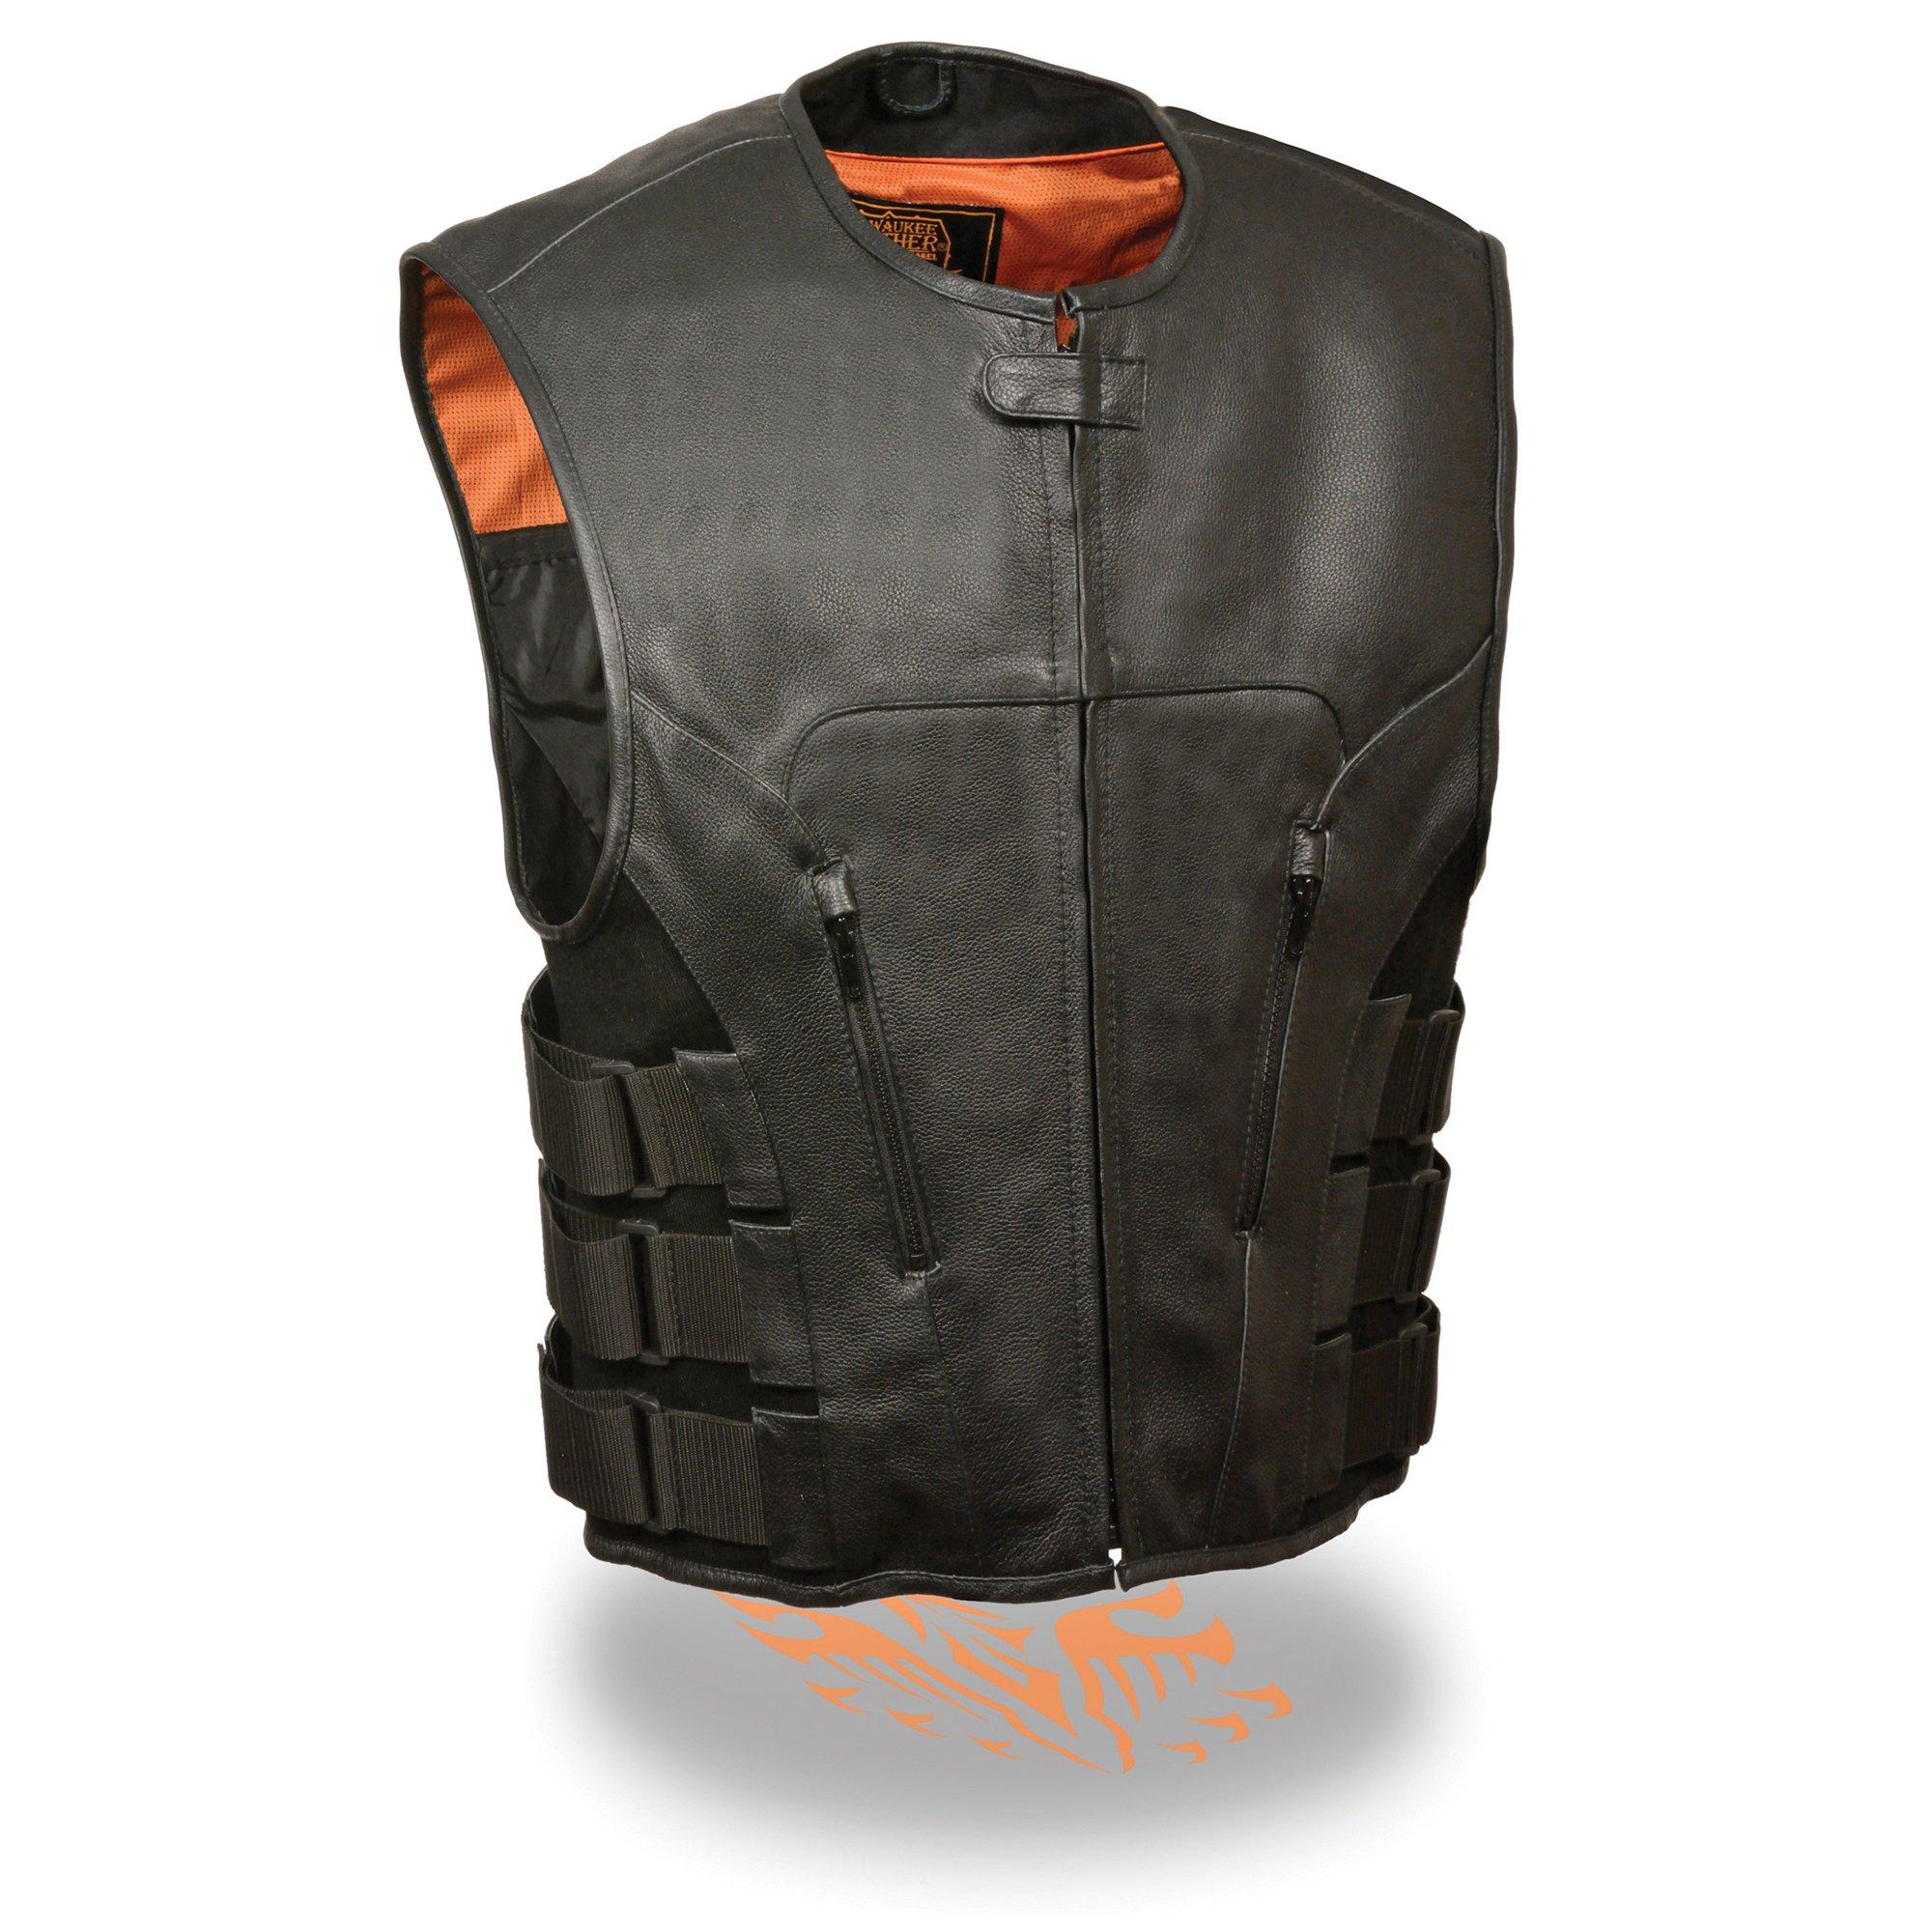 Milwaukee Leather Men's Bullet Proof Look Swat Motorcycle Club Vest w/Single Panel Back & Dual Inside Gun Pockets (Large.)